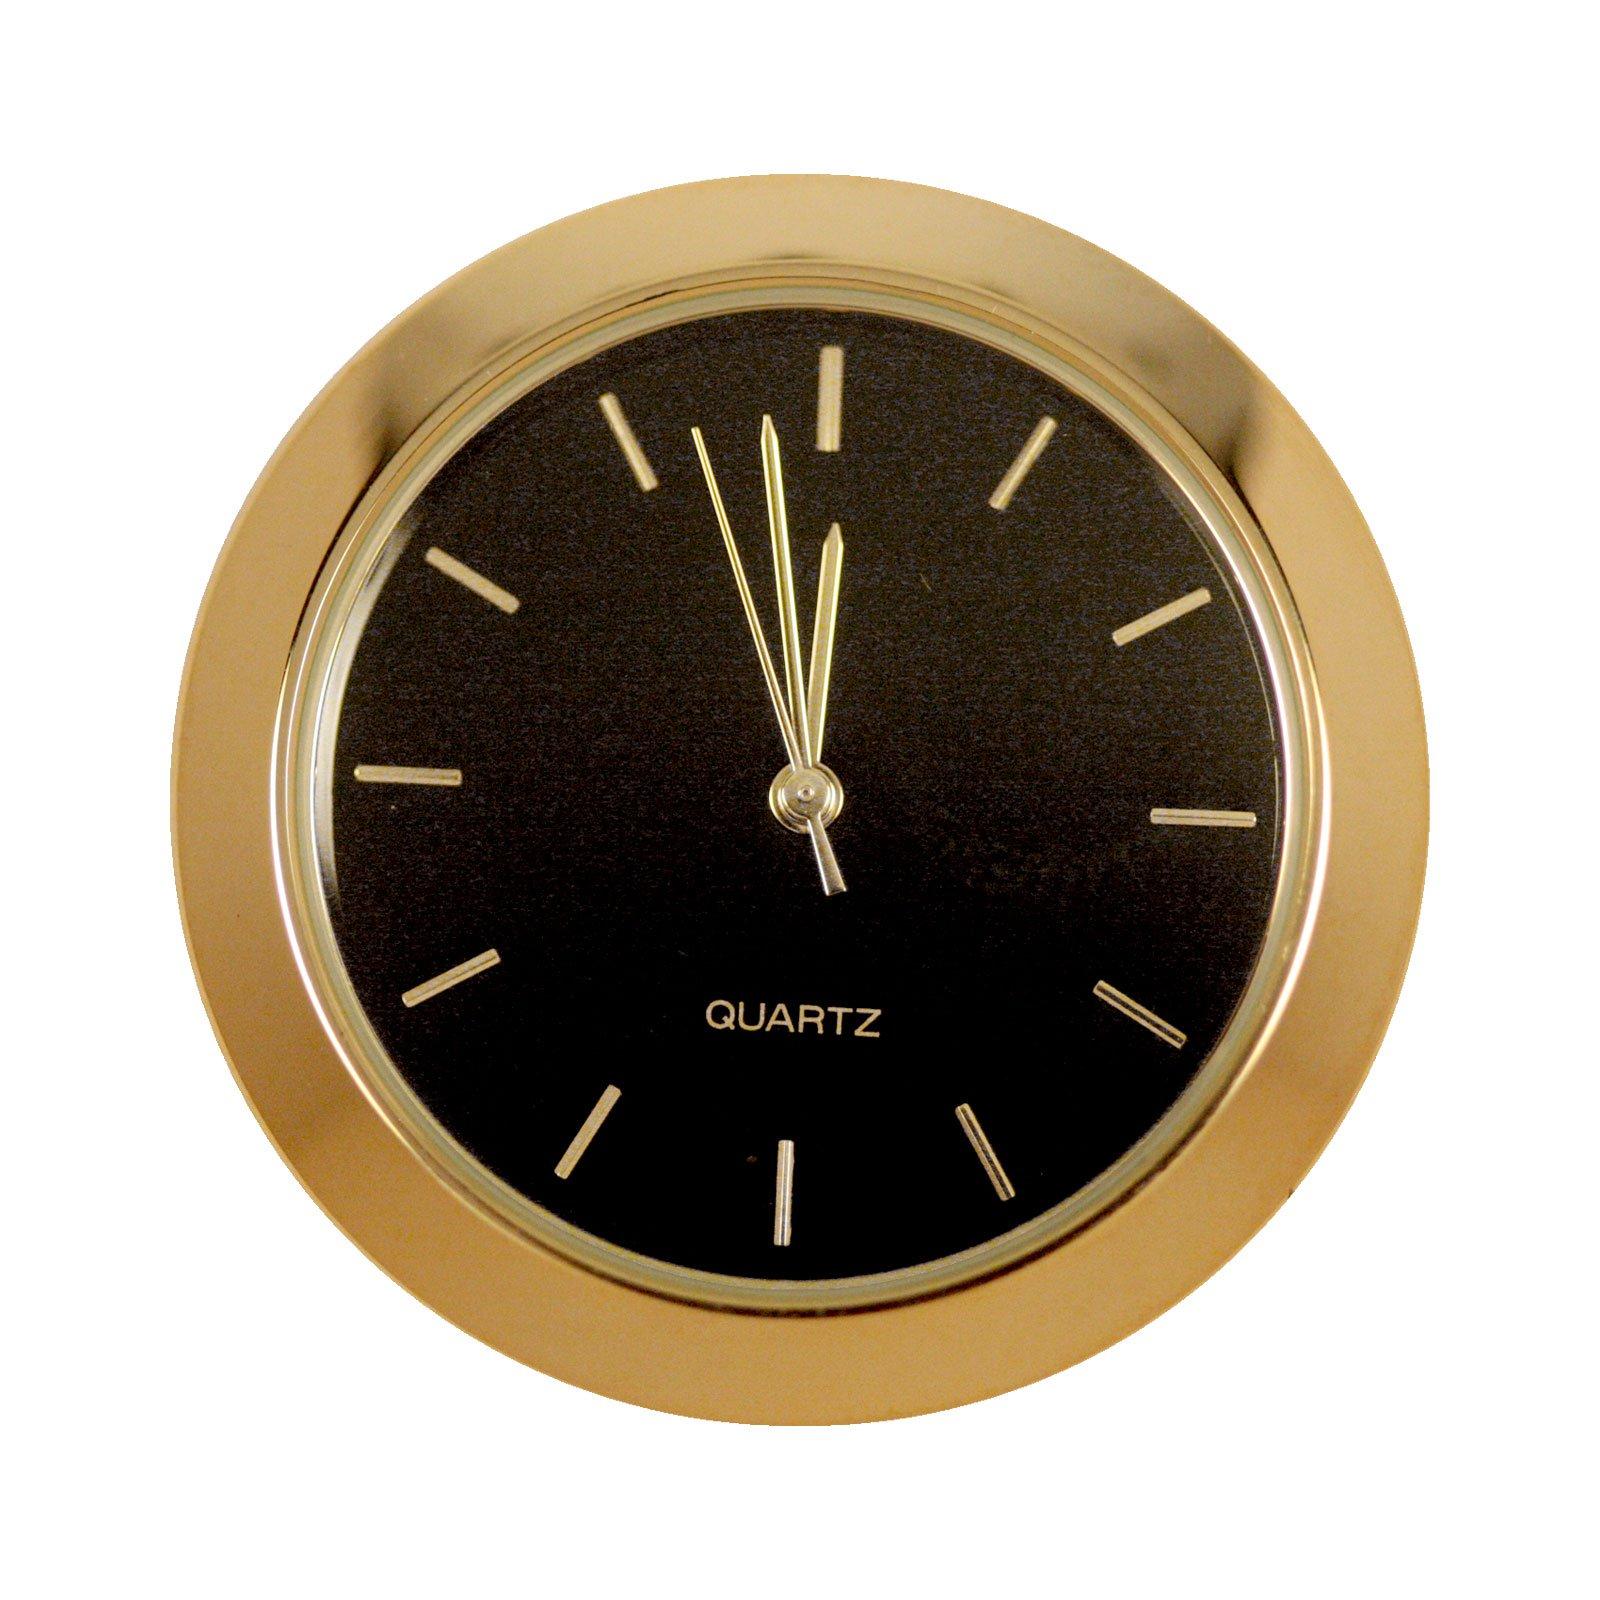 1 716 In Mini Clock Black Face Gold Indicators At